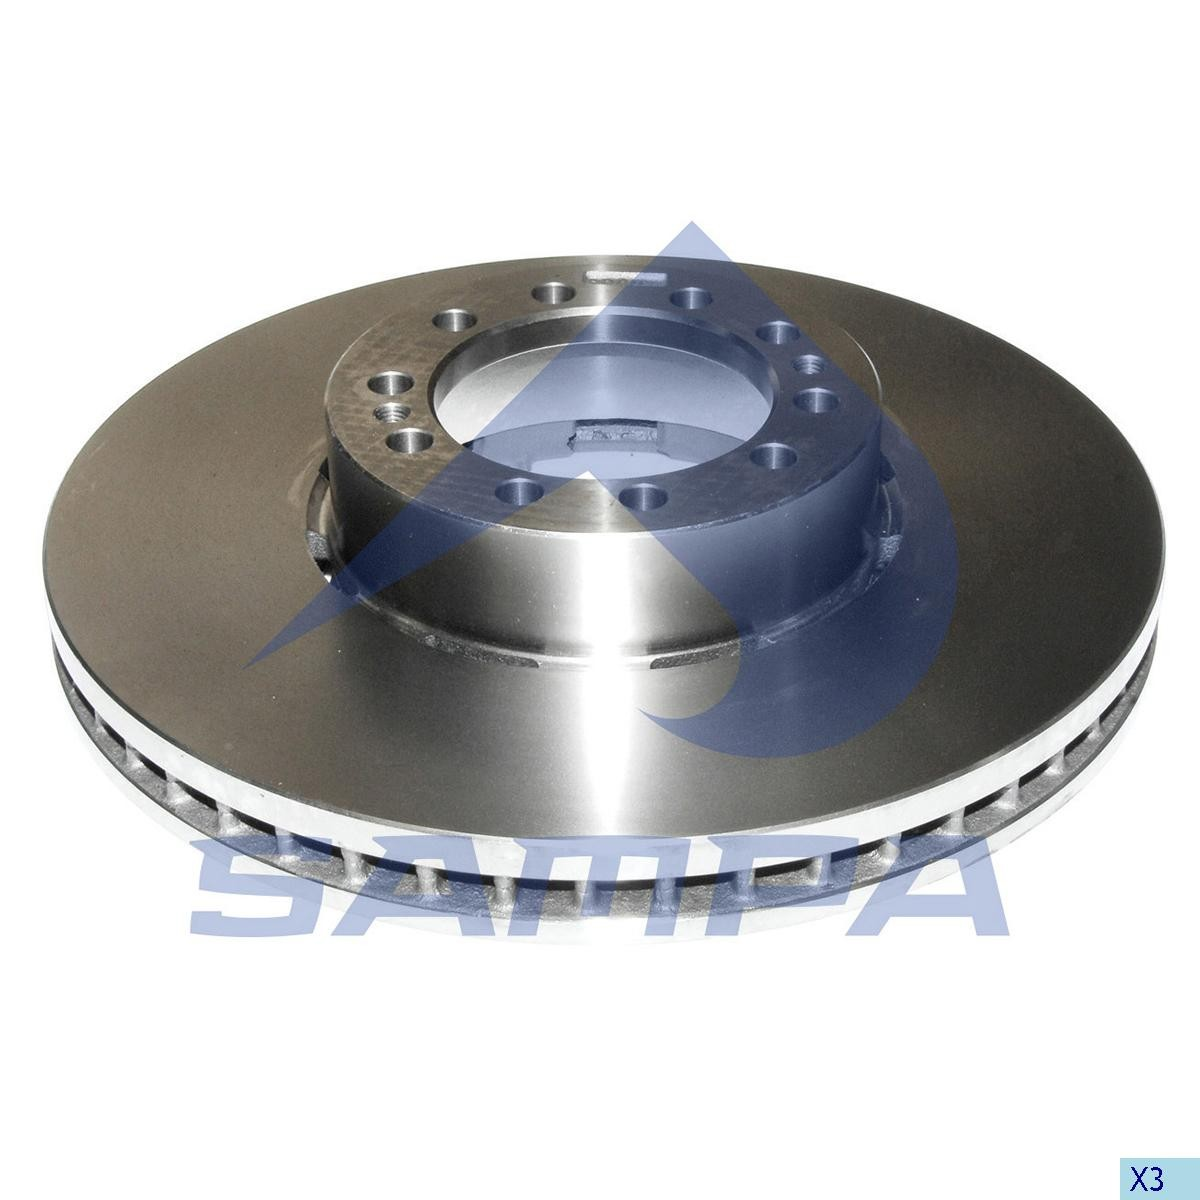 Тормозной диск RENAULT 438х45мм/10 photo